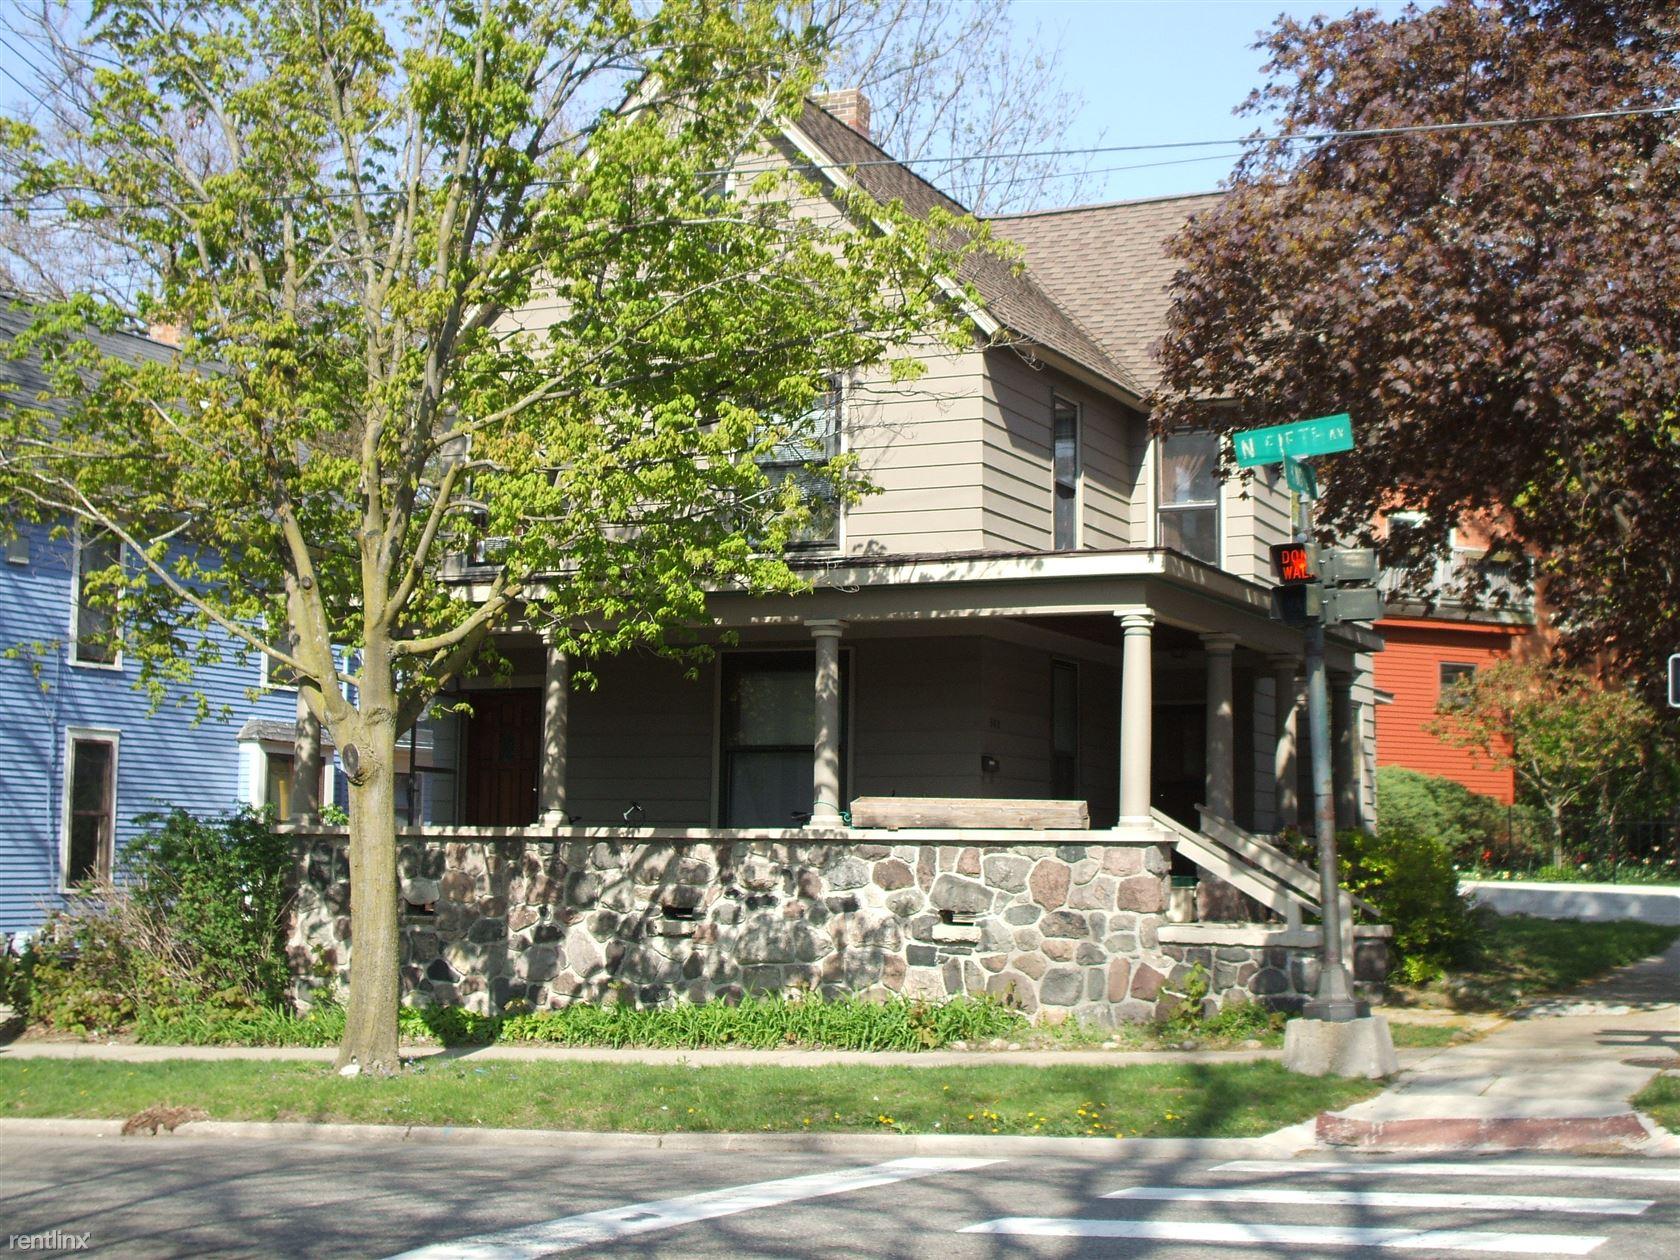 502 N 5th Ave Apt 1, Ann Arbor, MI - $2,300